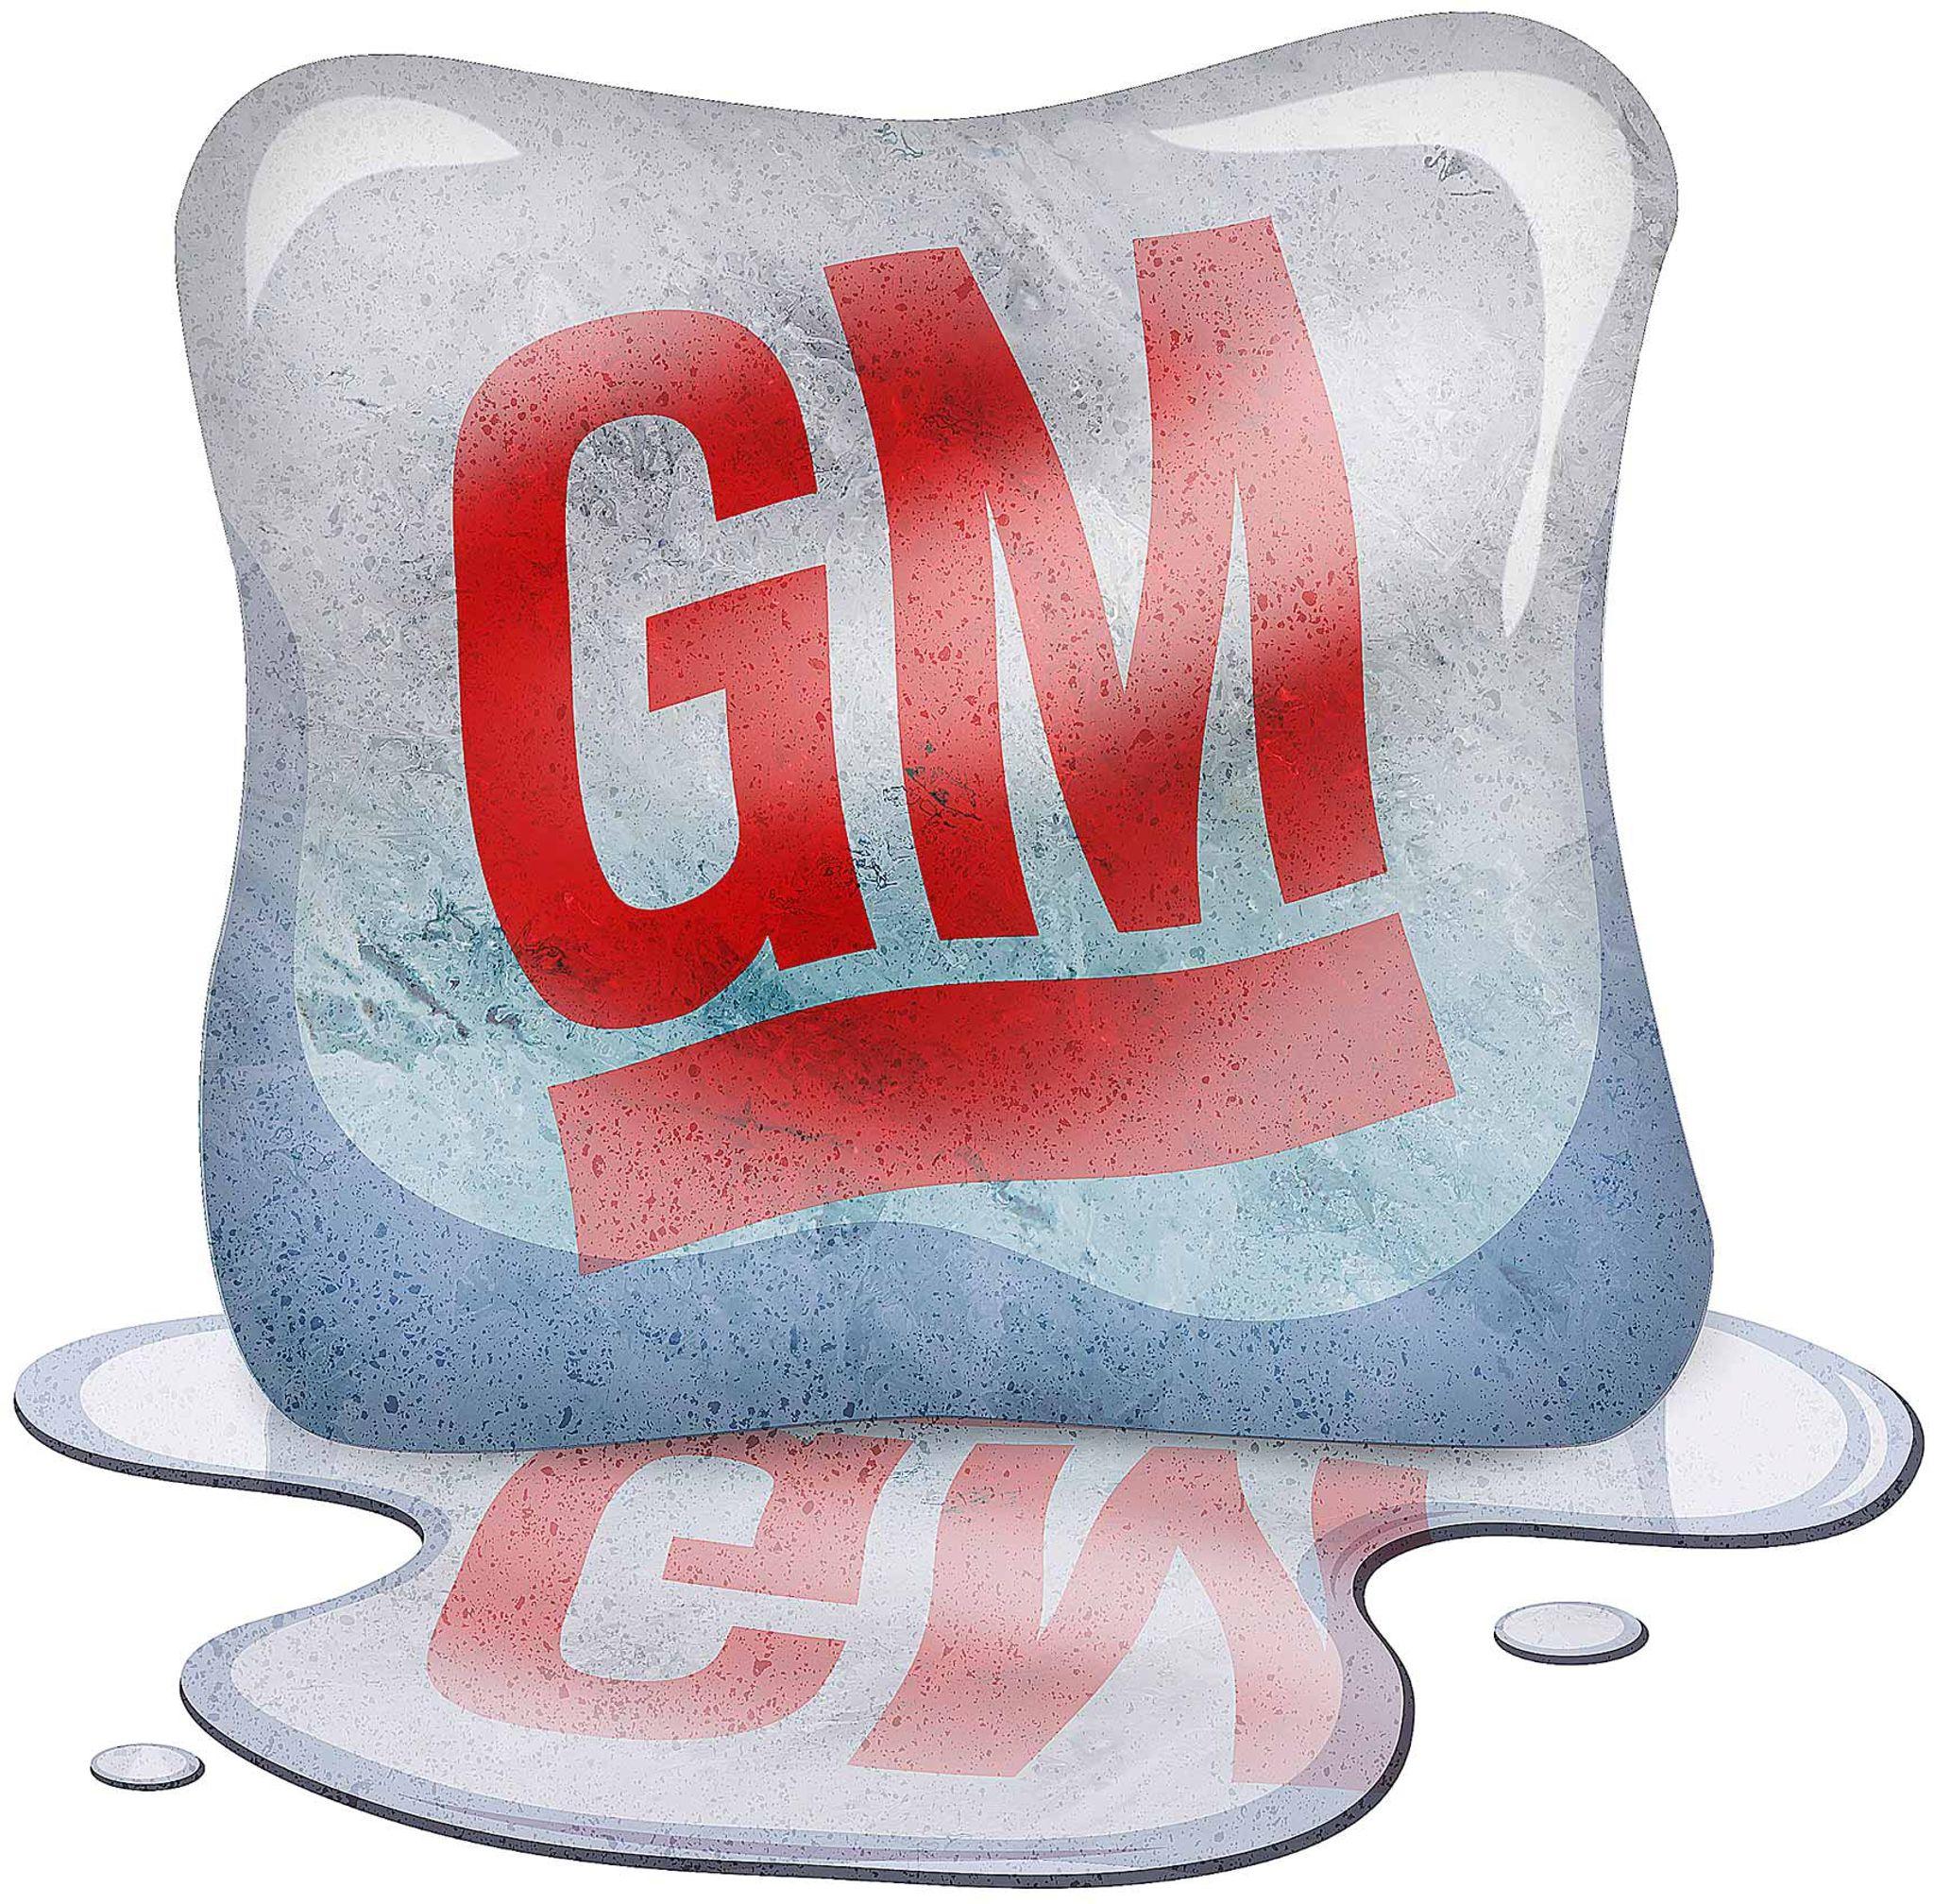 The melting away of General Motors